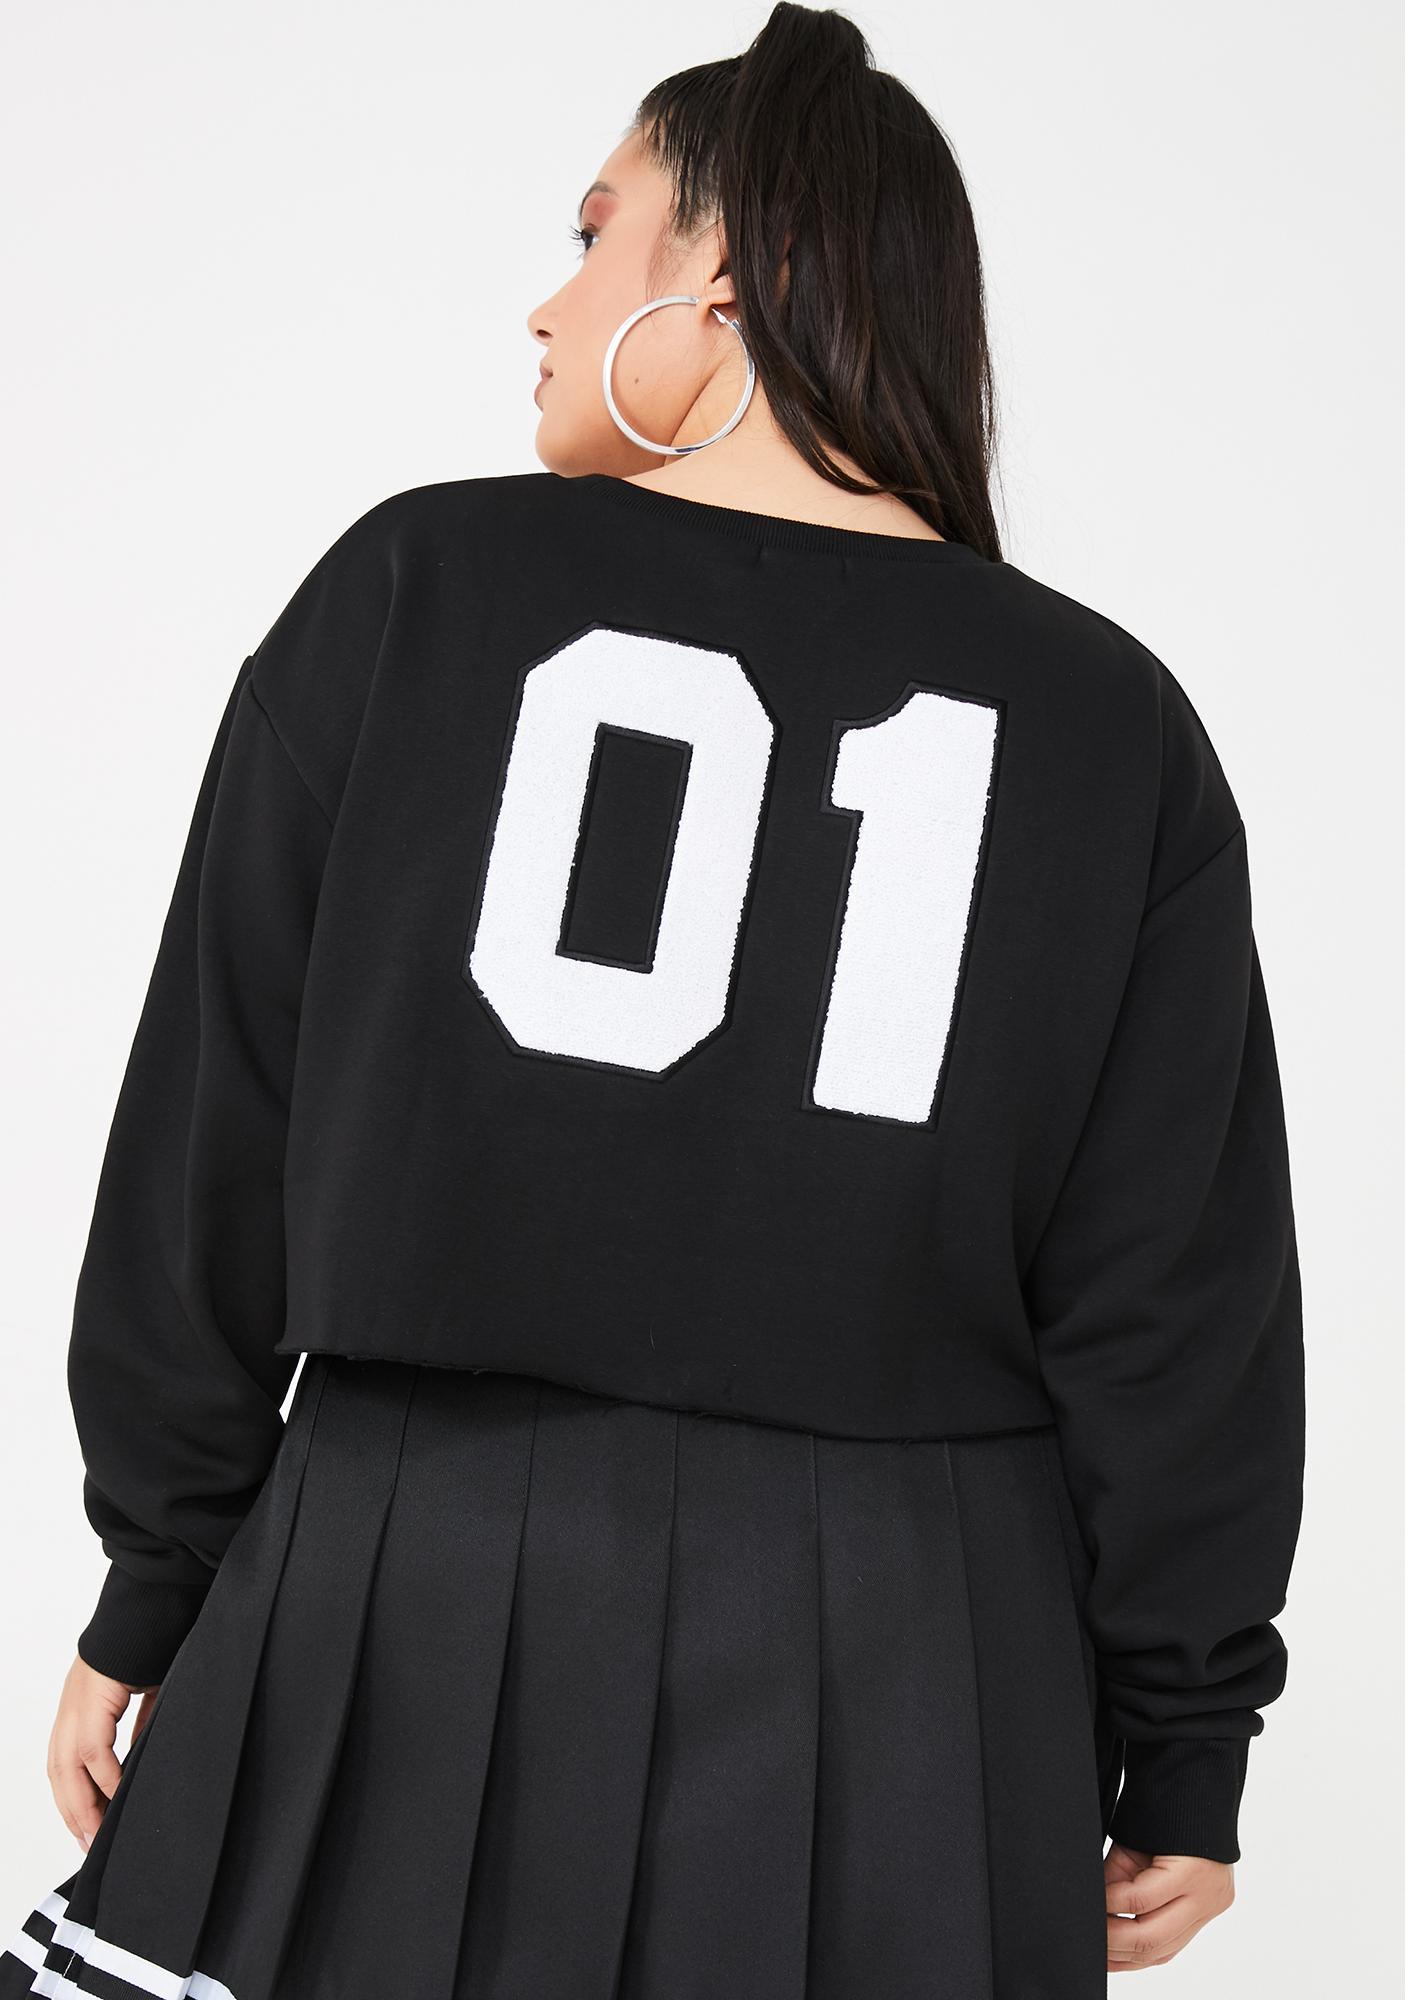 Poster Grl Legit Bish Squad Cropped Sweatshirt